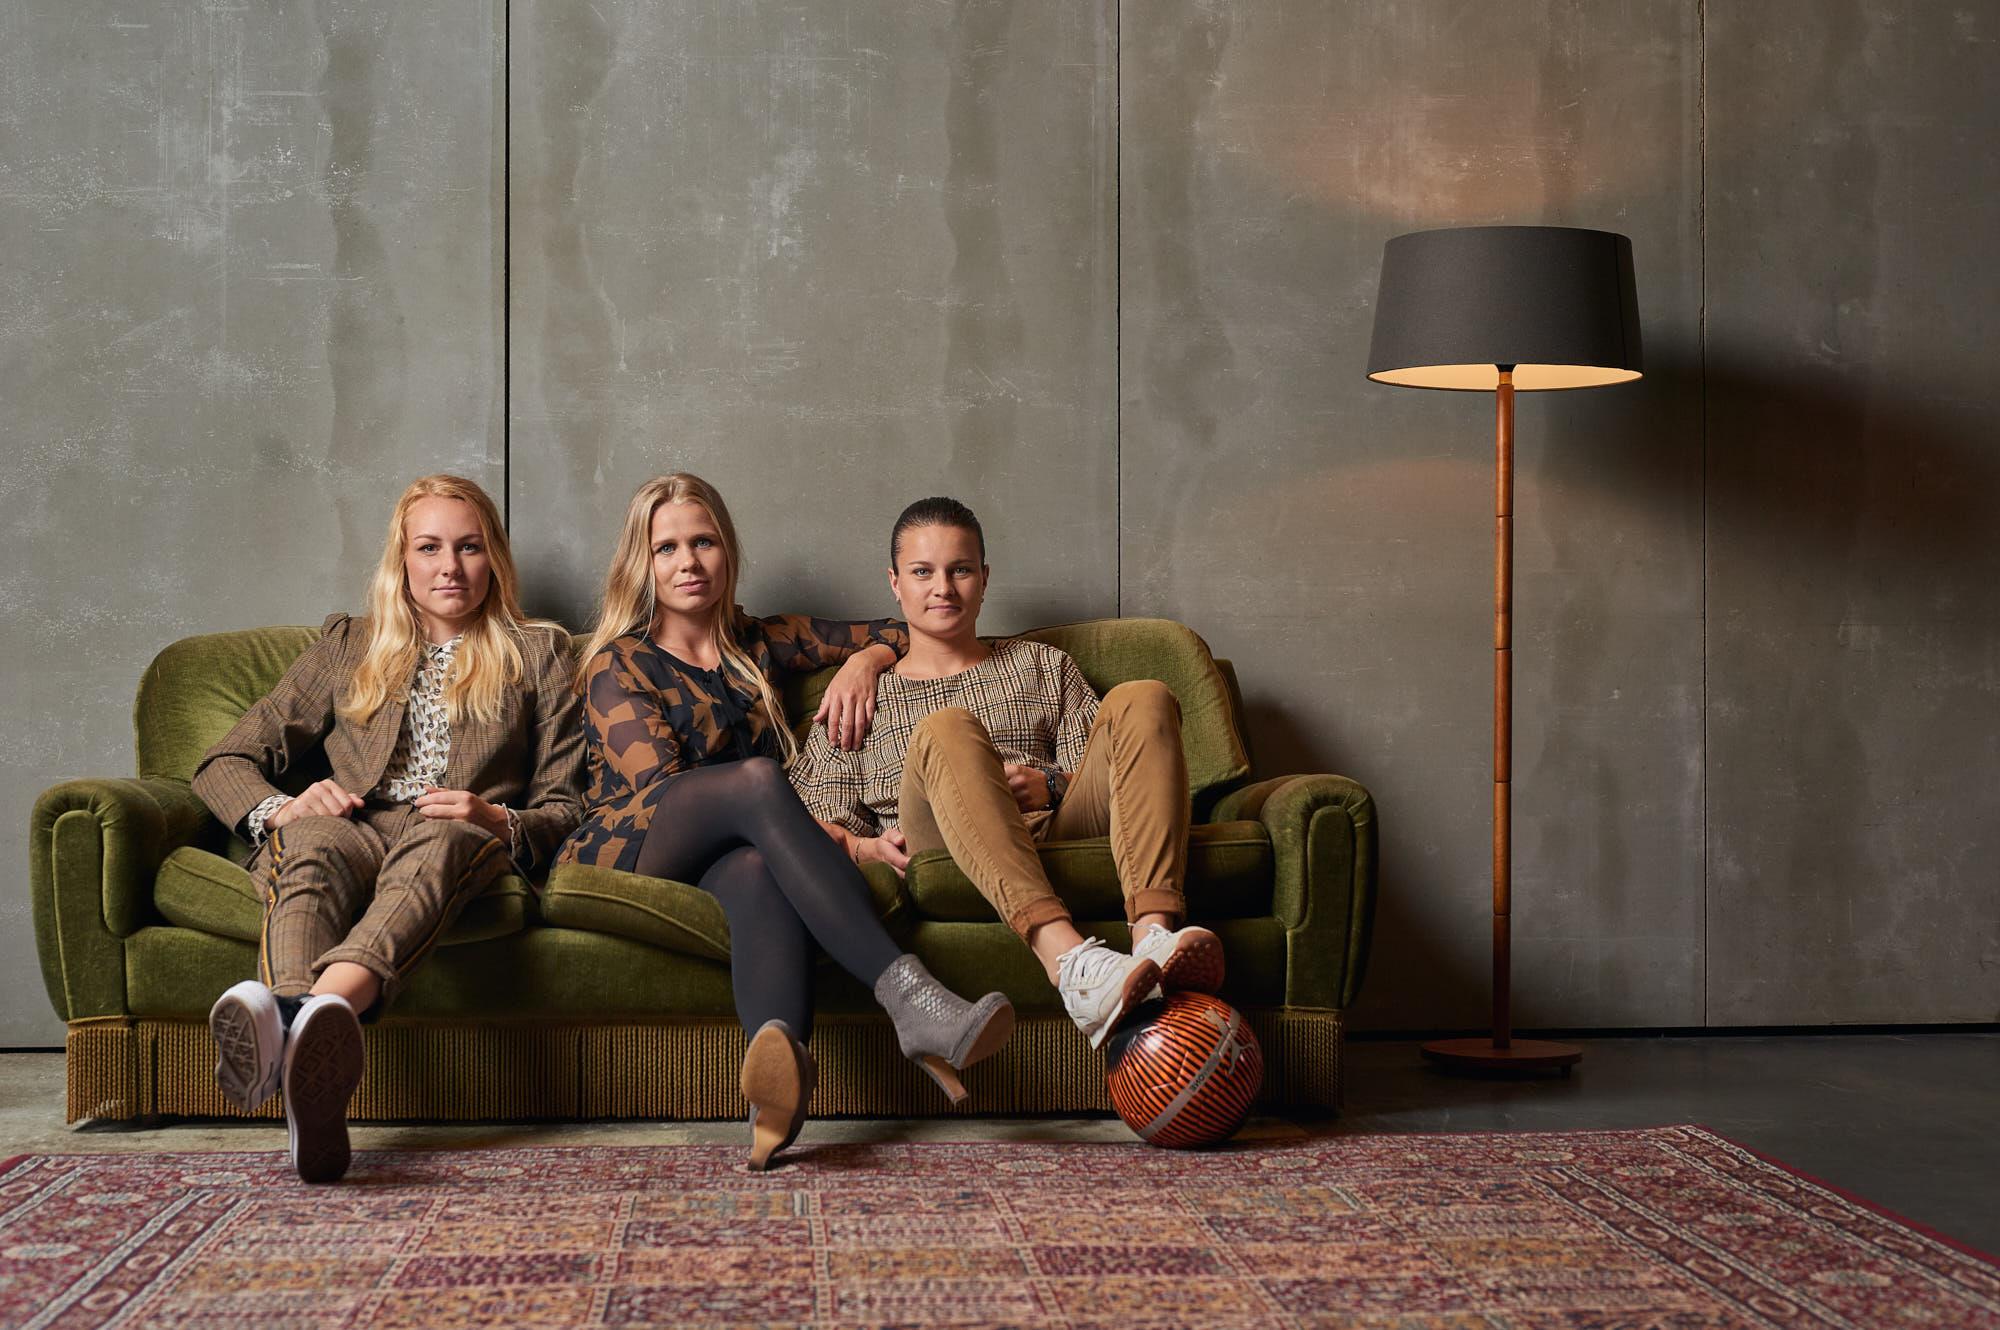 Group photo of football players Kika van Es, Sherida Spitse and Danique Kerkdijk